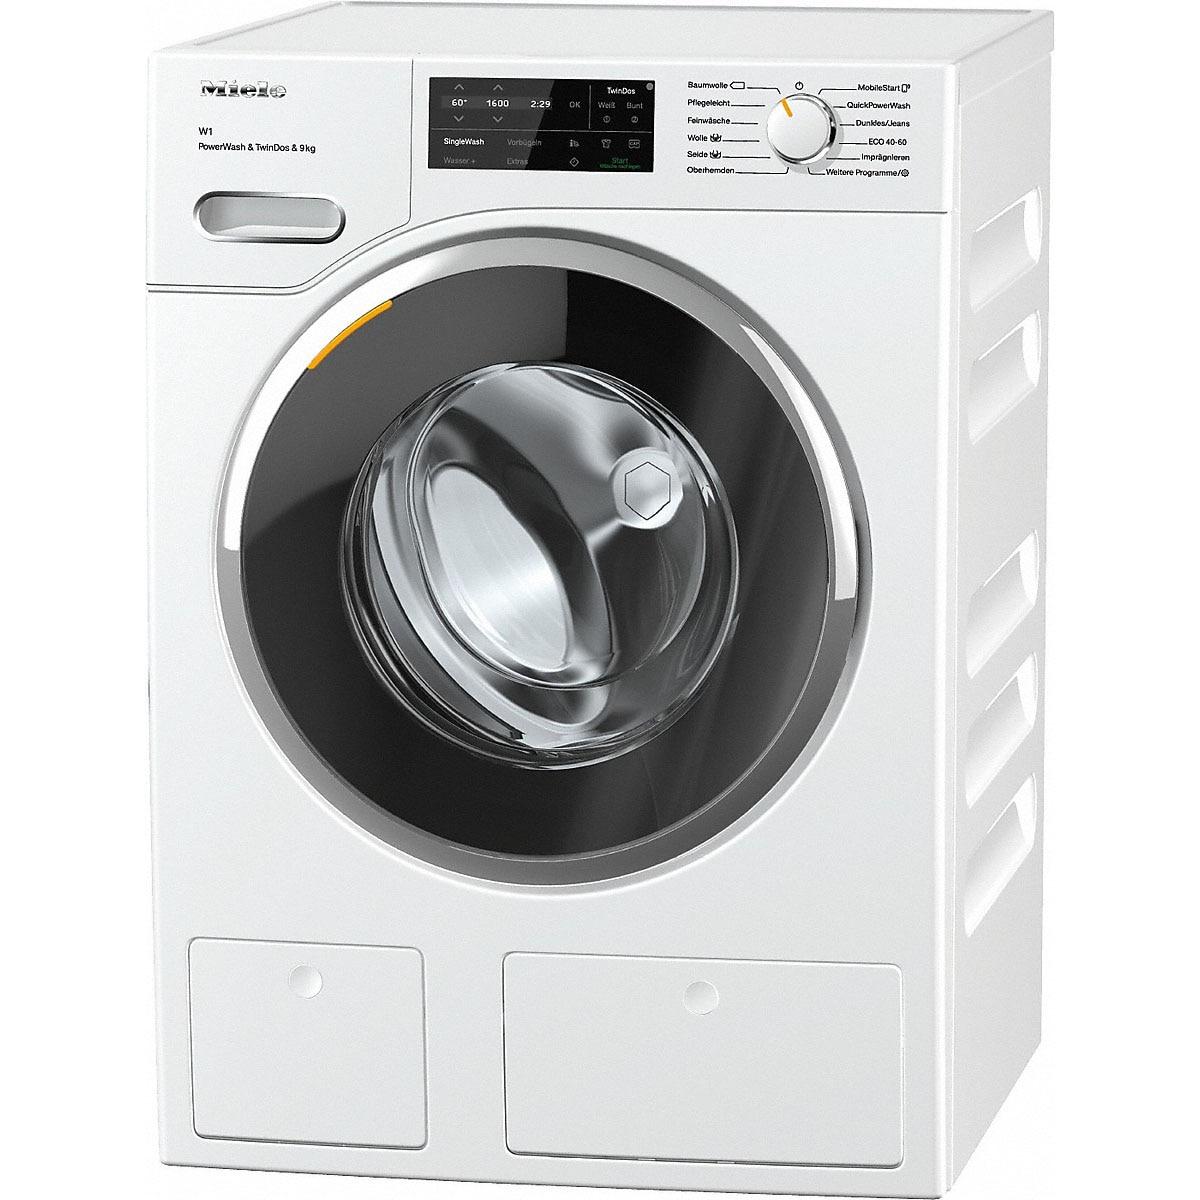 Fotografie Masina de spalat rufe Miele WWI 860 WPS, 9kg, 1600 rpm, Clasa A, QuickPowerWash & TwinDos, CapDosing, WiFiConn@ct, Alb